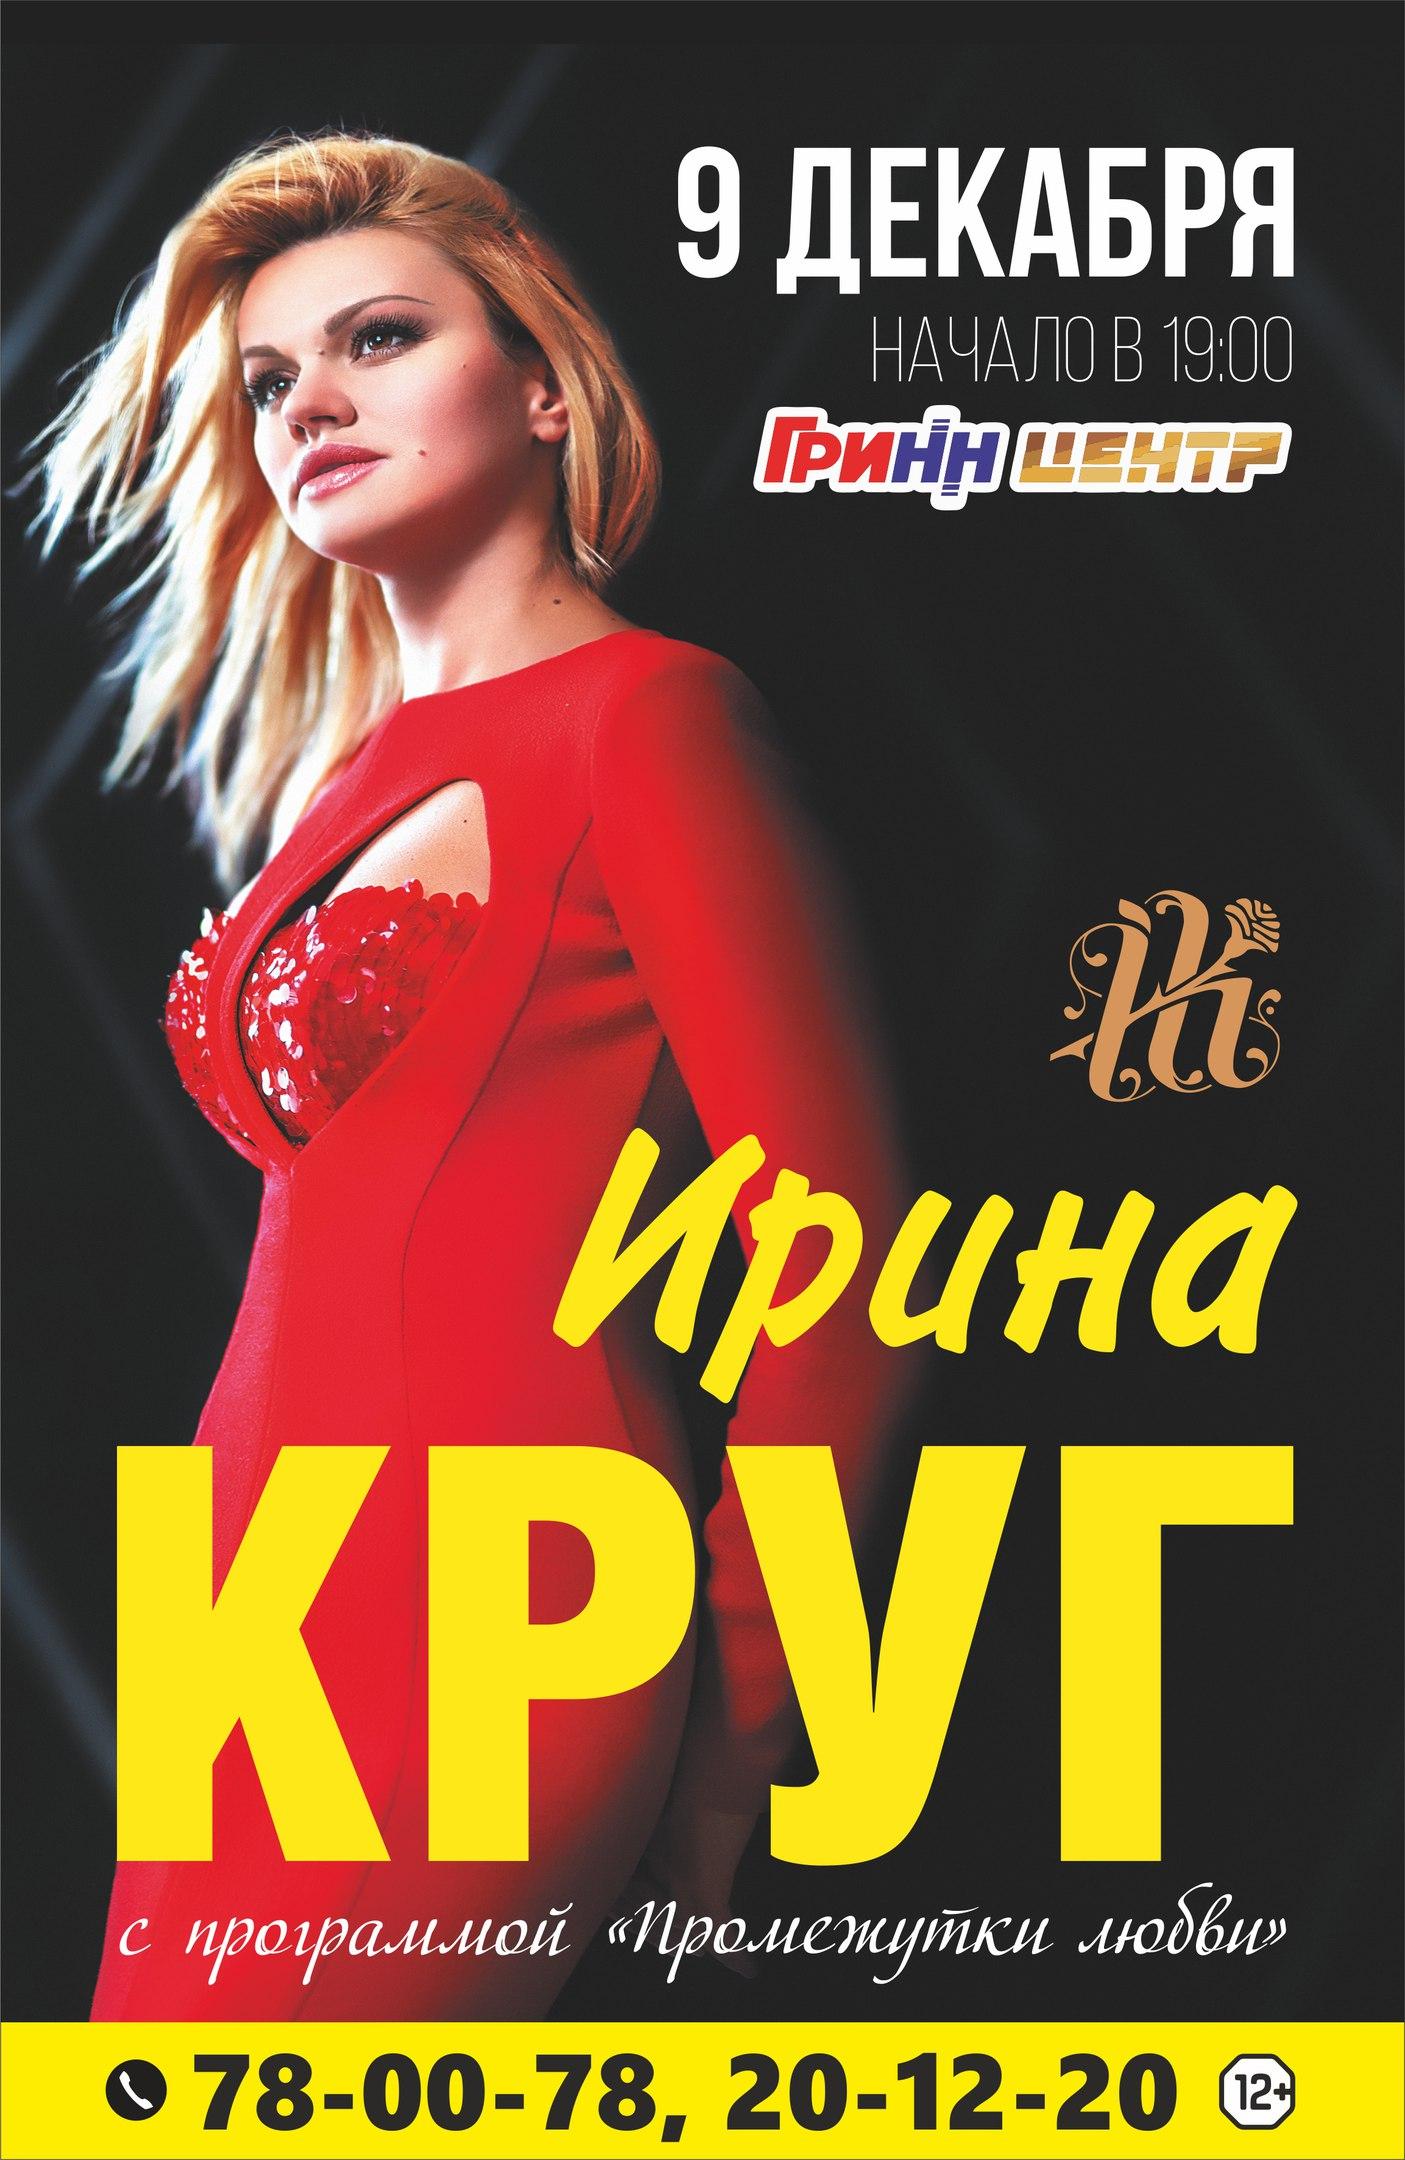 Ирина Круг «Промежутки любви»